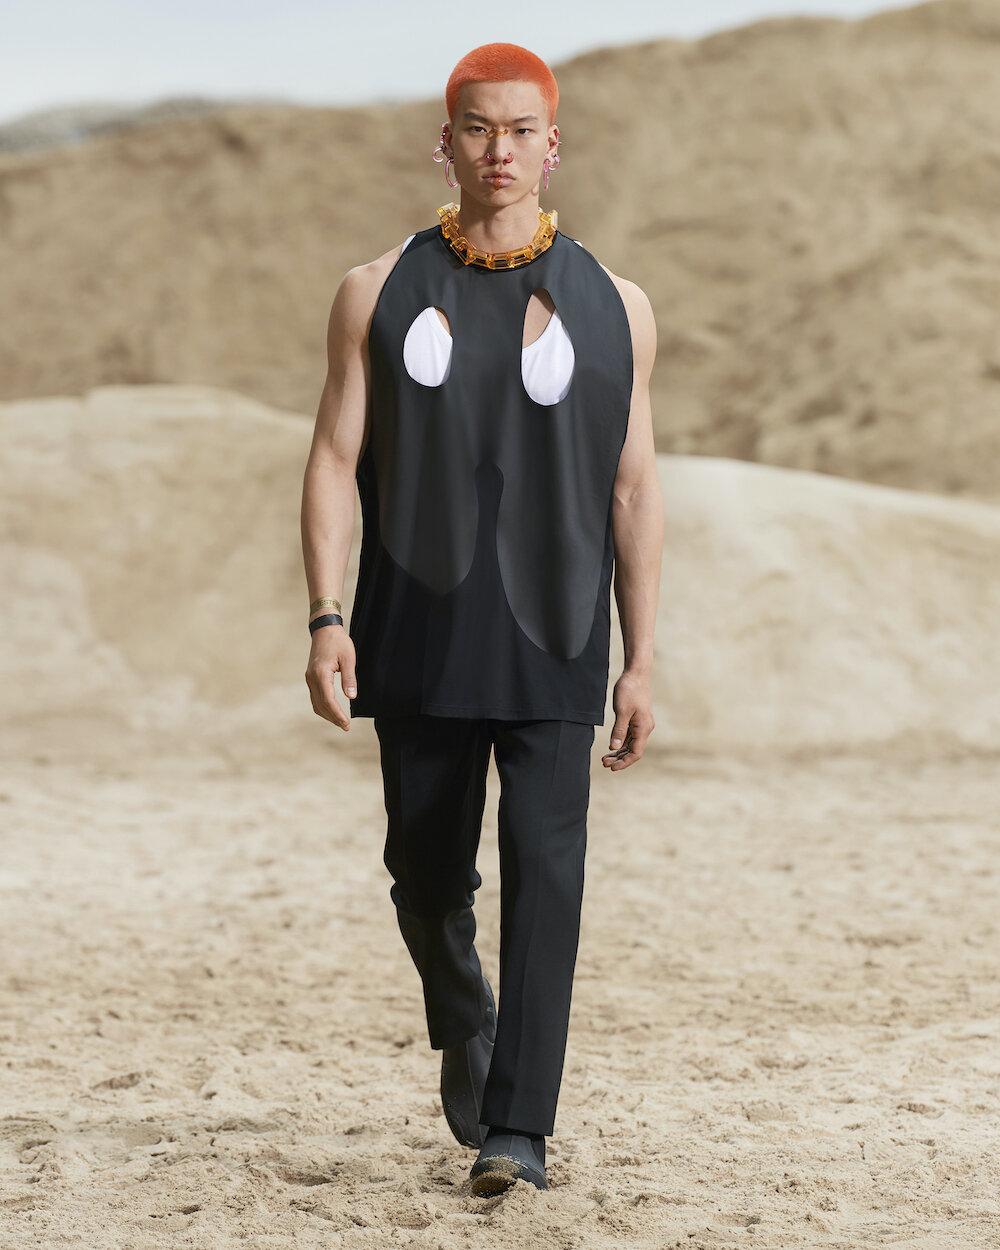 Burberry Spring_Summer 2022 Menswear Presentation Collection - Look 17 - Nic.jpg